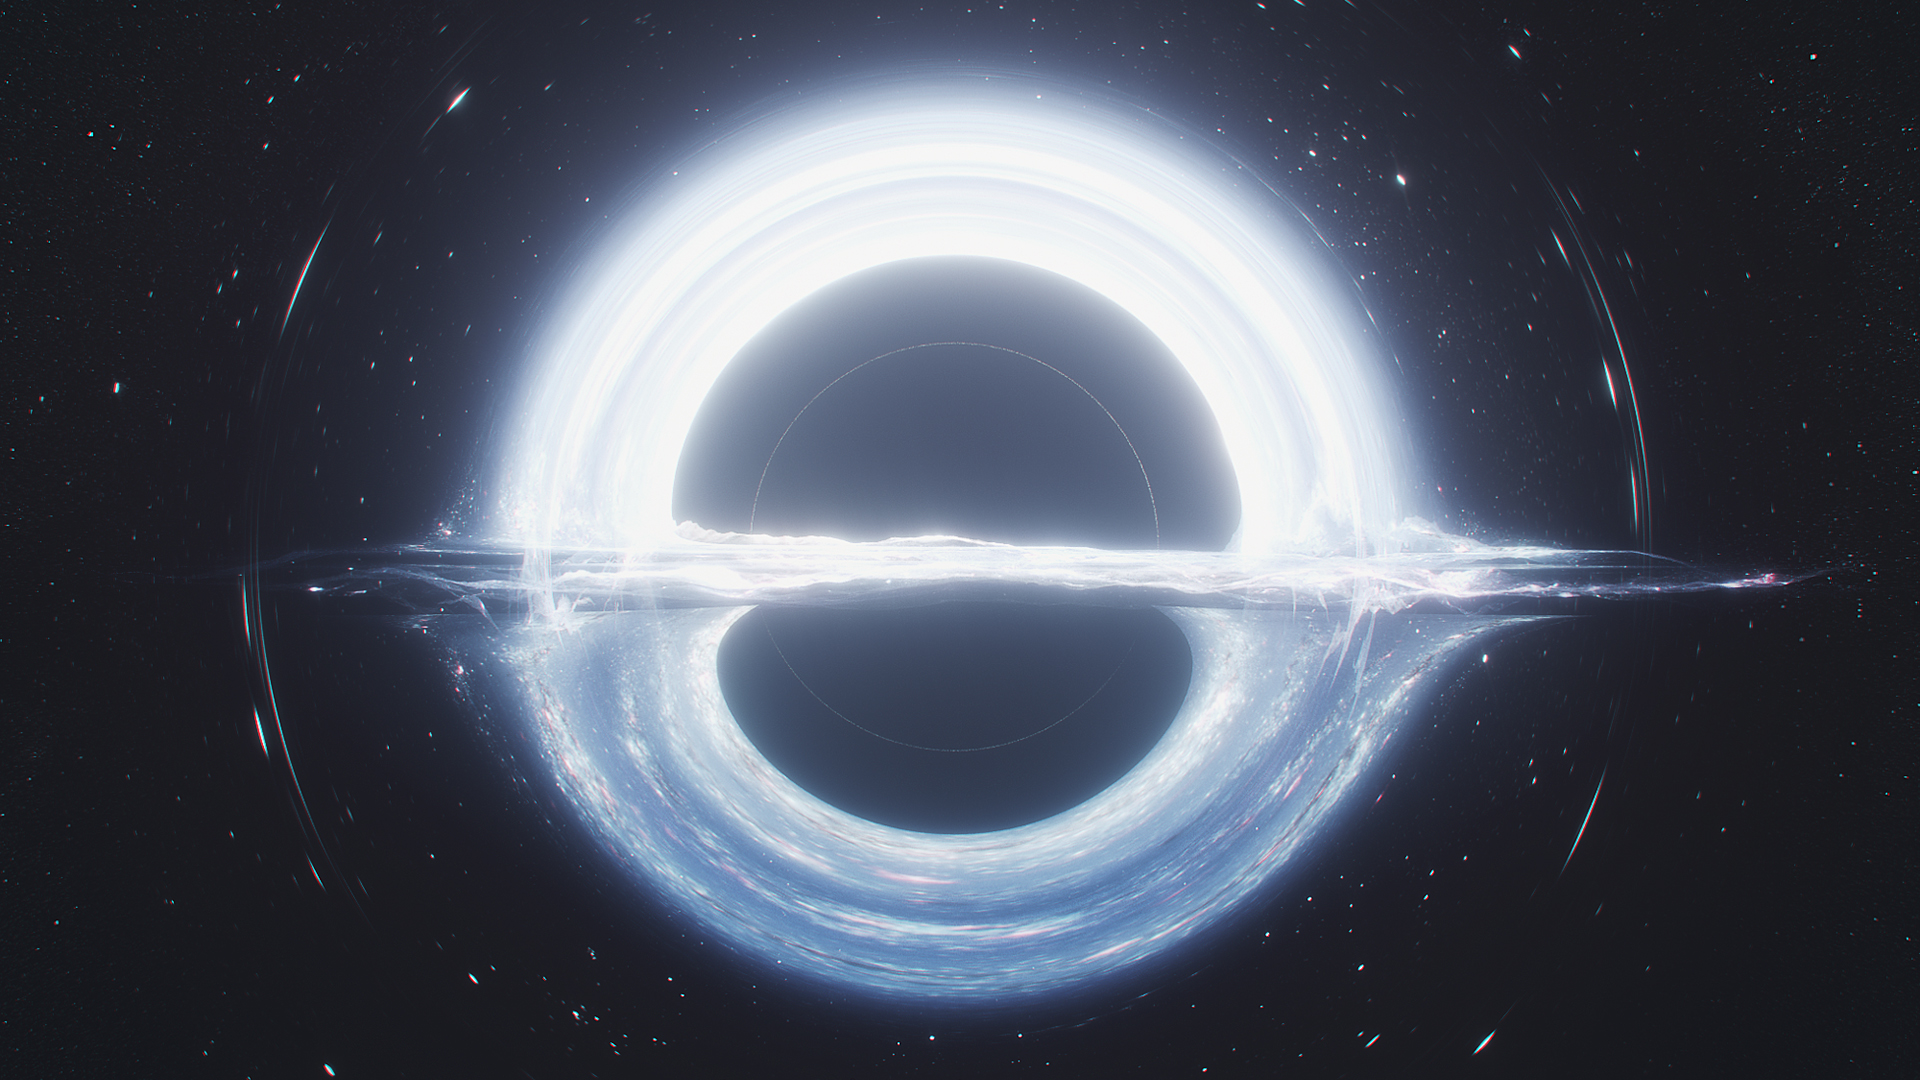 General 1920x1080 space sky black holes planet